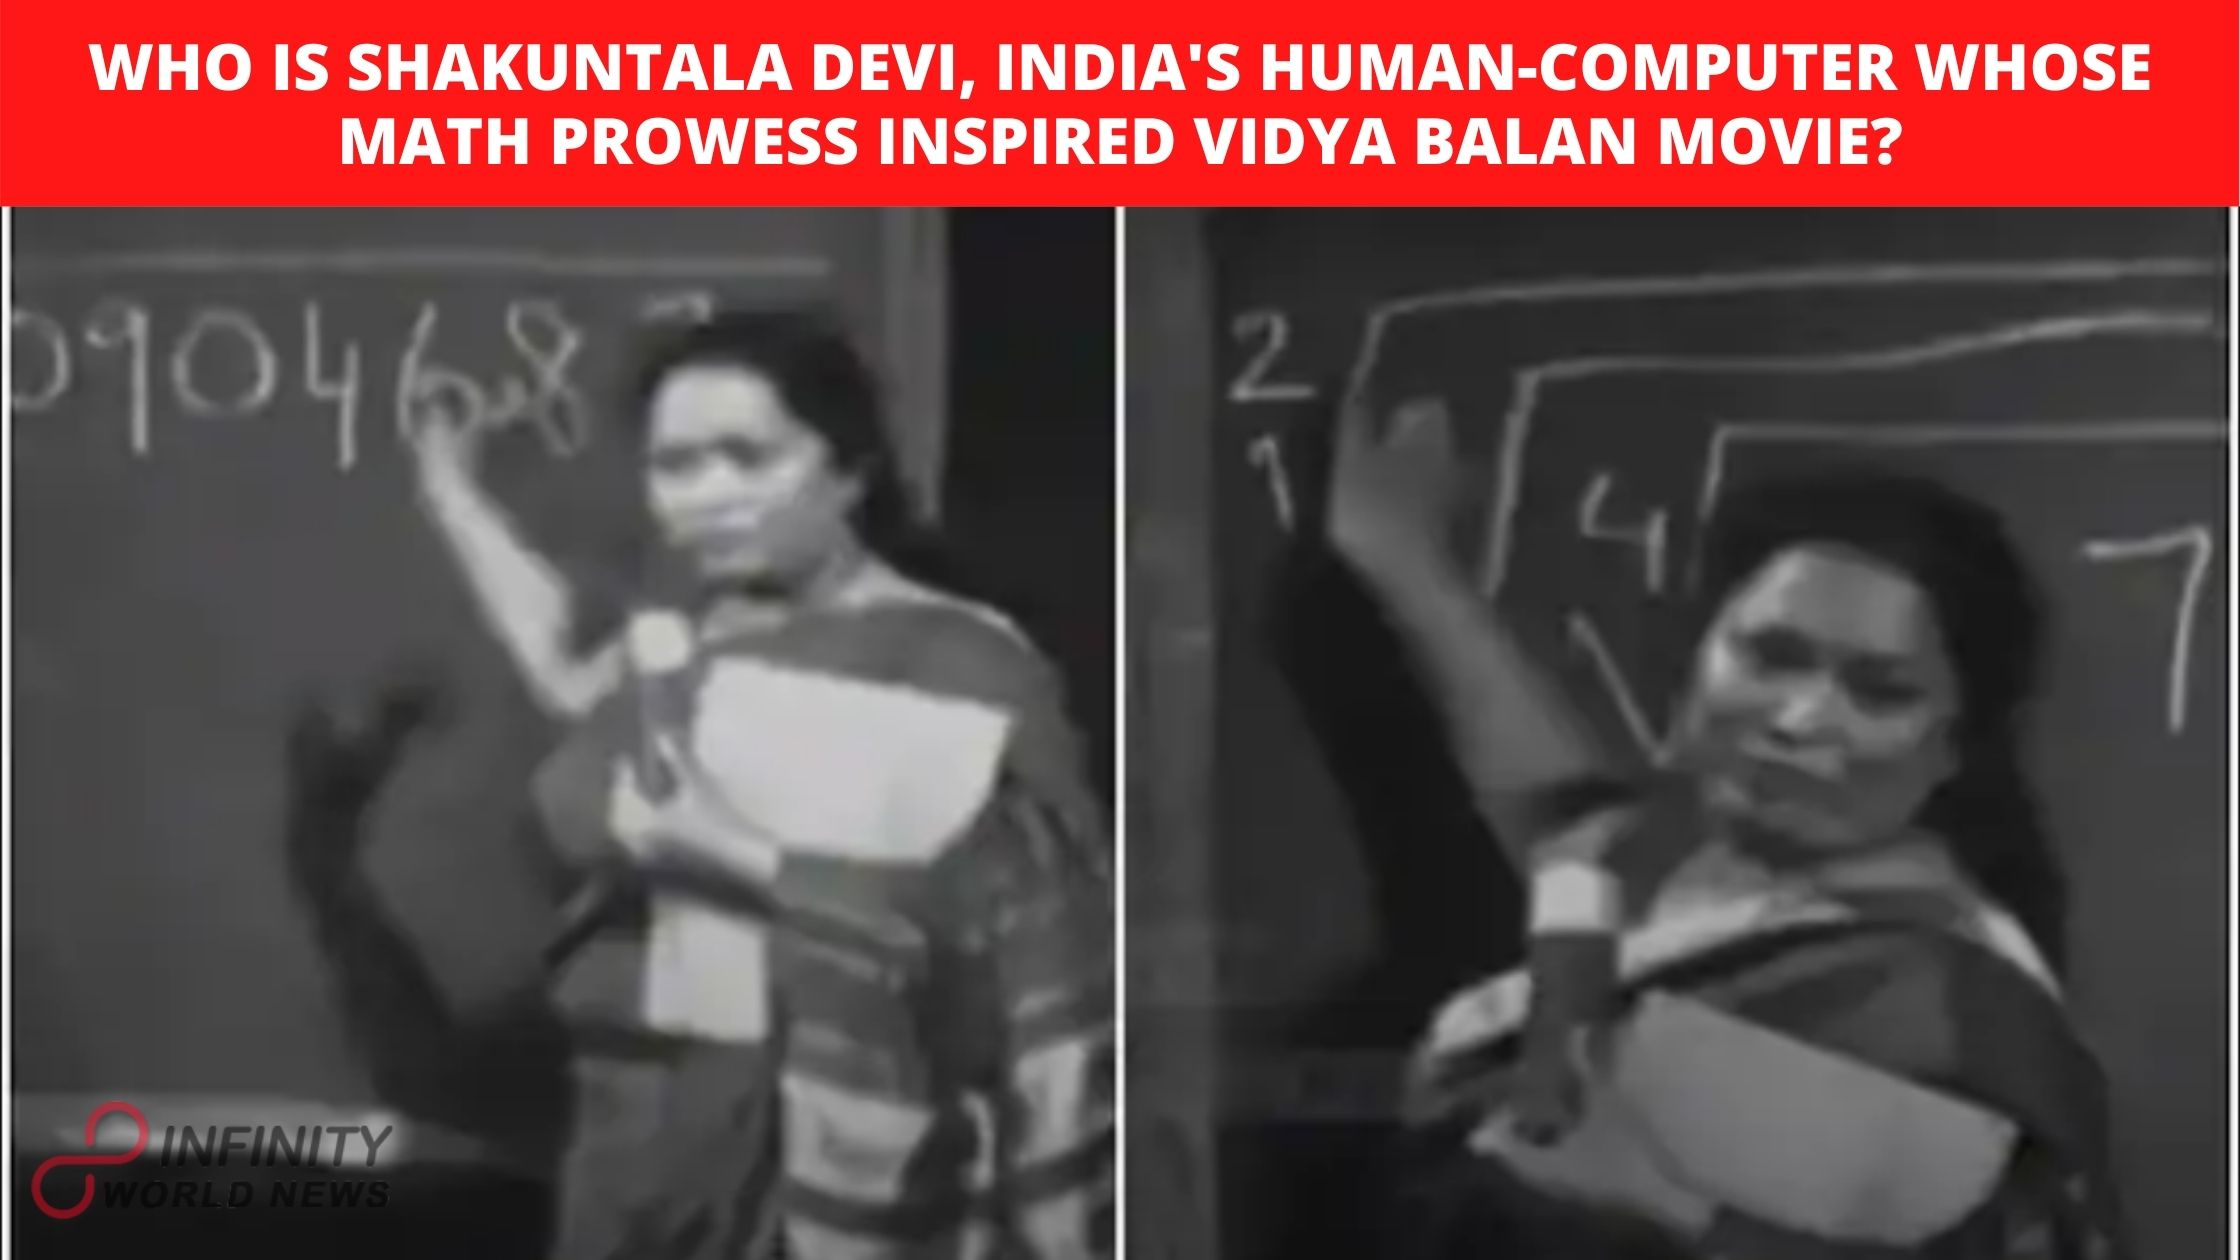 Who Is Shakuntala Devi, India's Human-Computer Whose Math Prowess Inspired Vidya Balan Movie